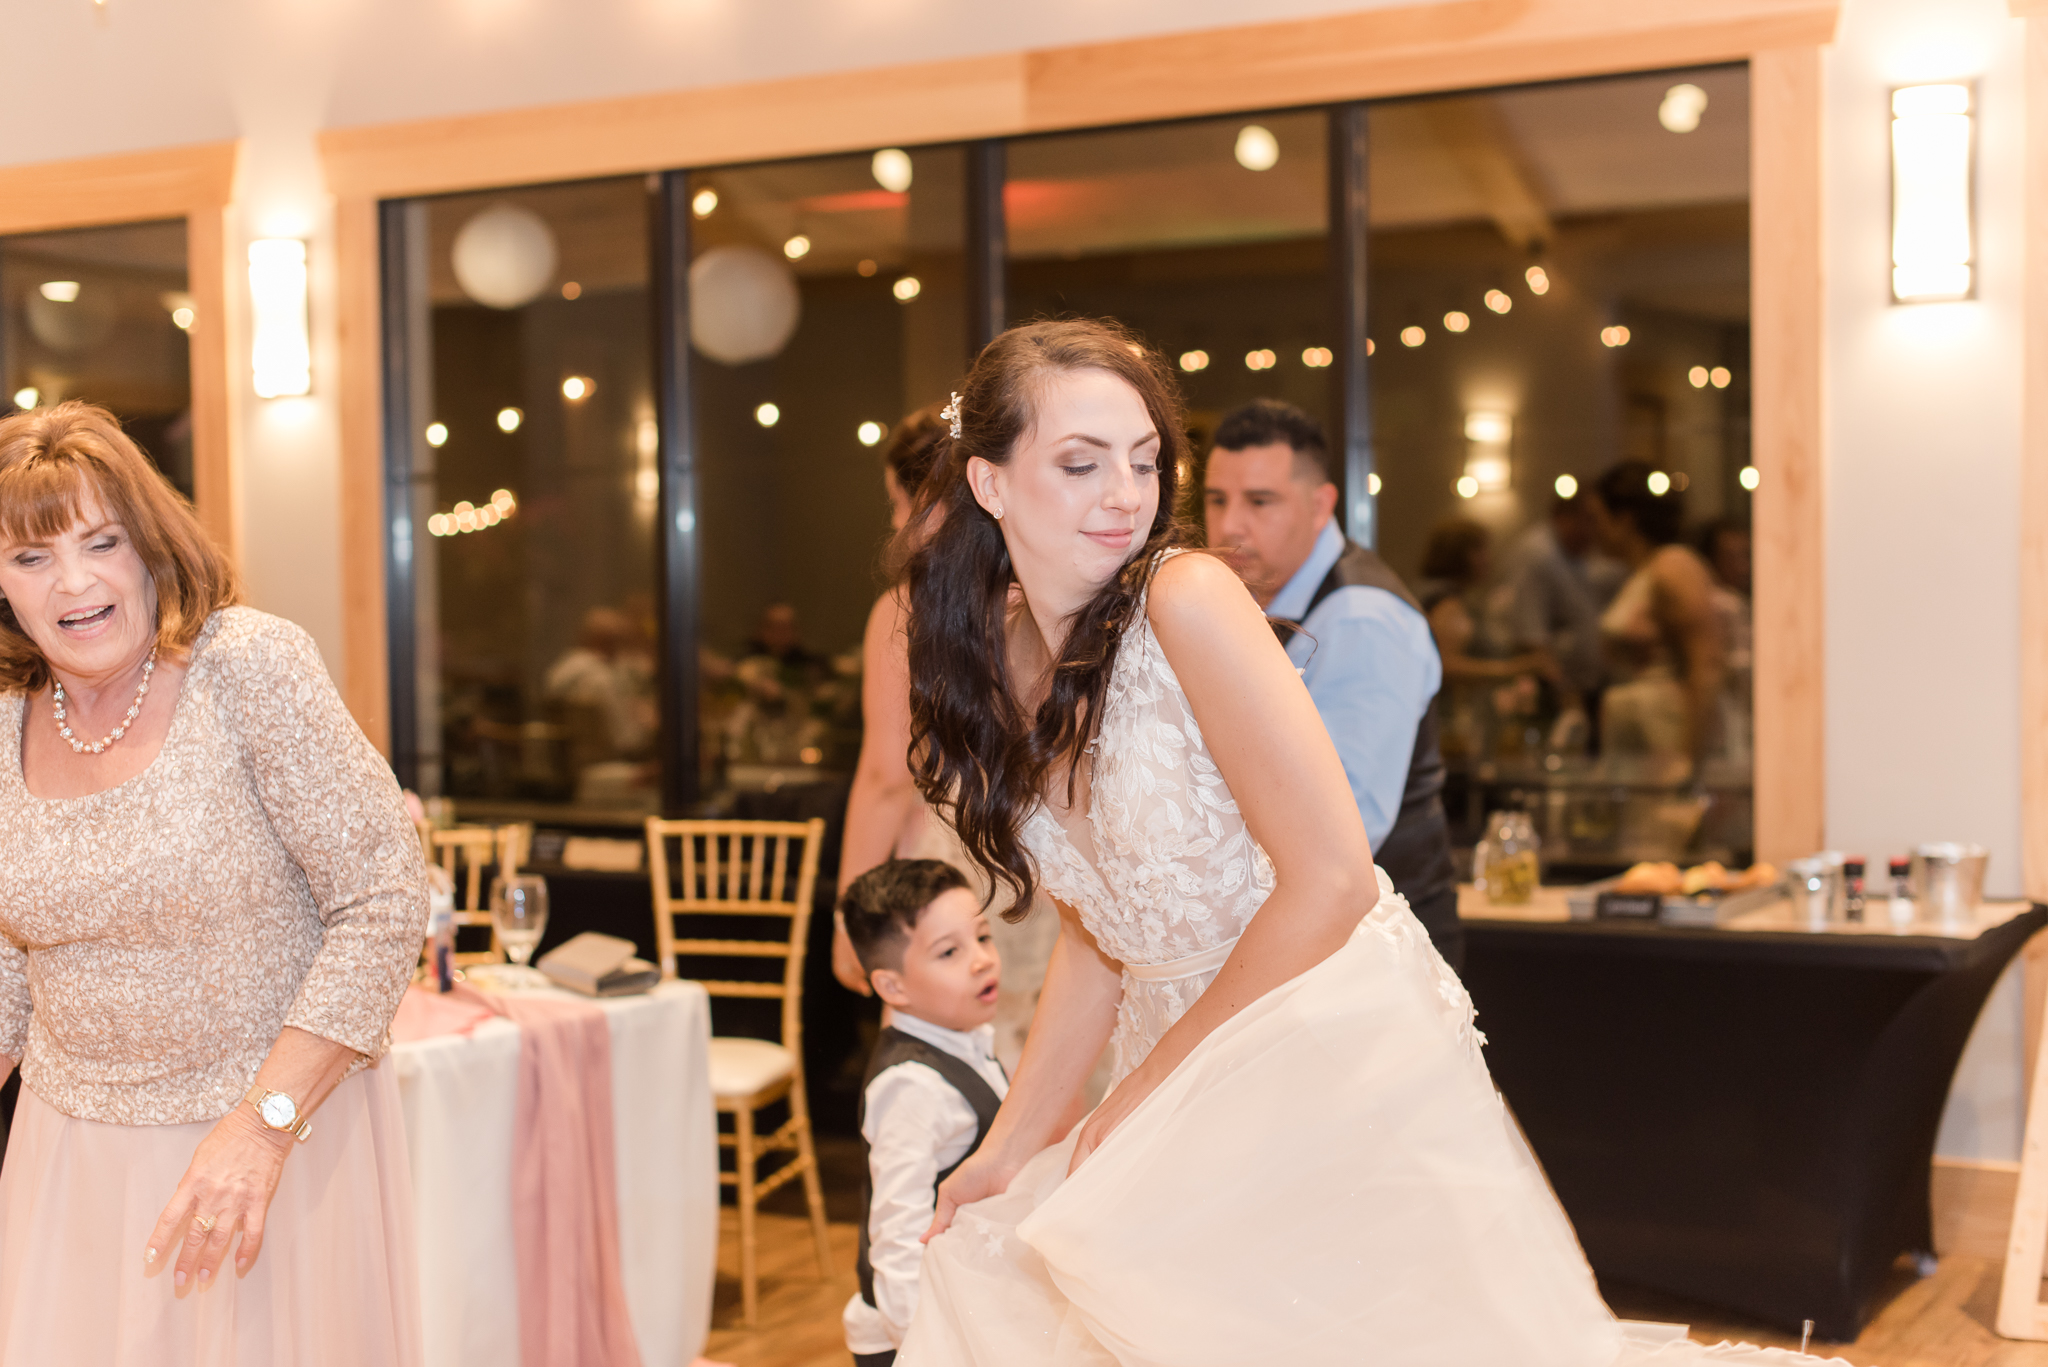 Sycamore at Mallow Run Wedding6874.jpg